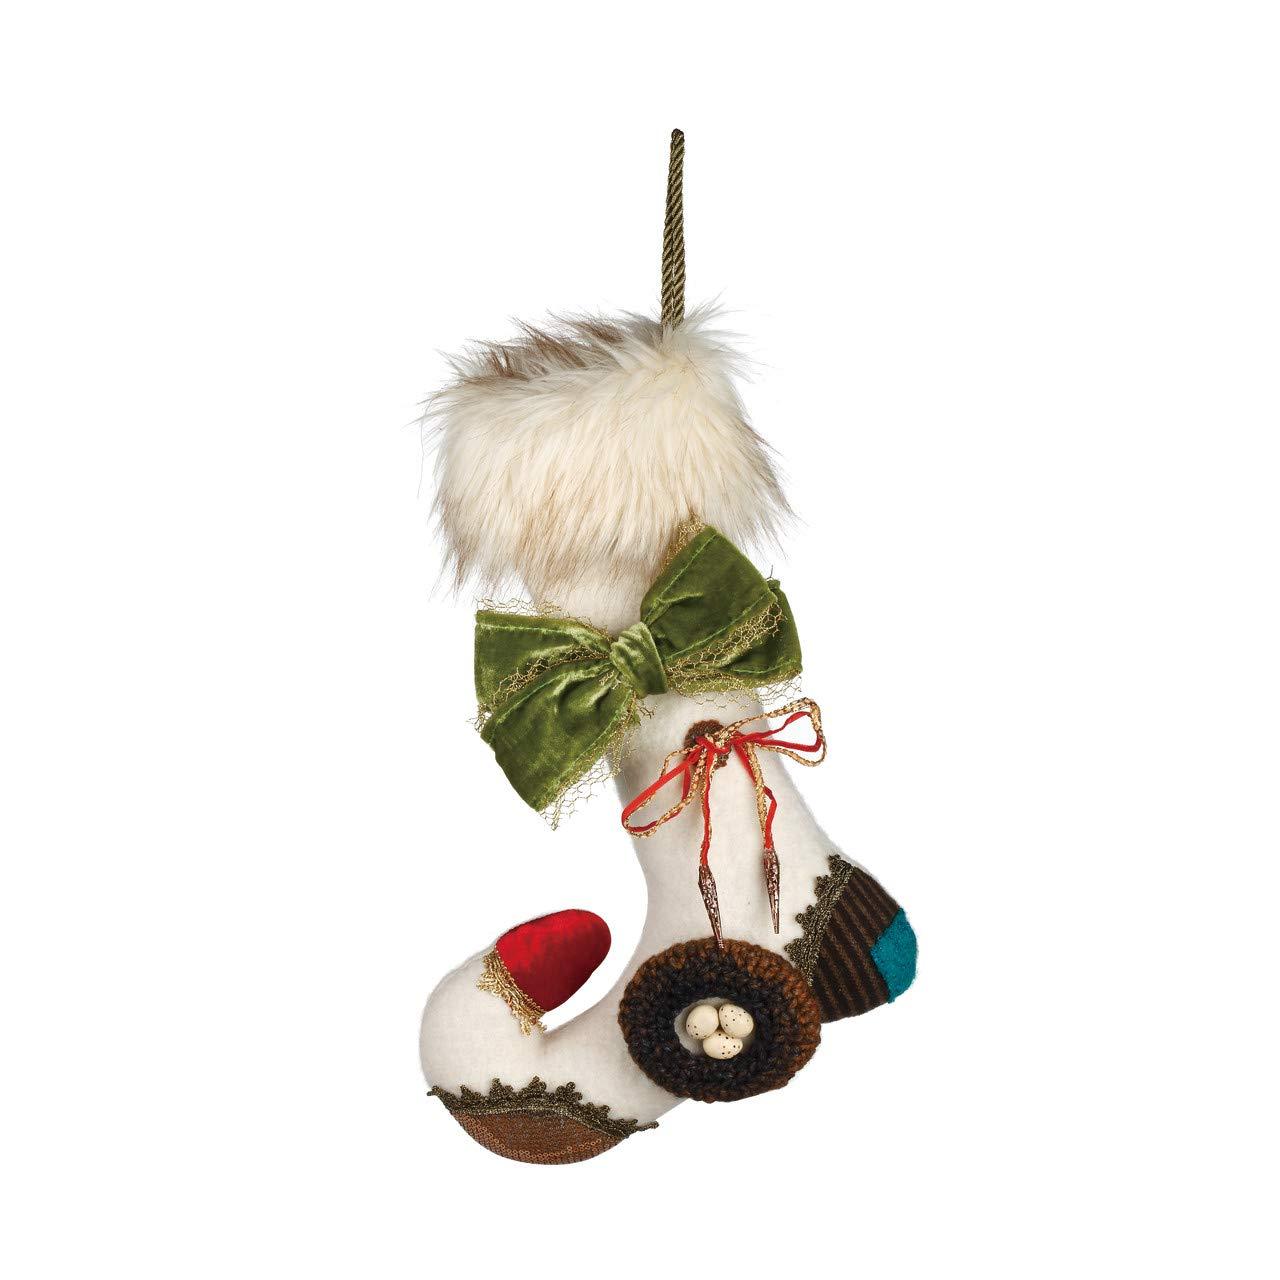 DEMDACO 14 inch Petite Amelia Faux Fur Cuff Christmas Stocking Decoration 2020180571